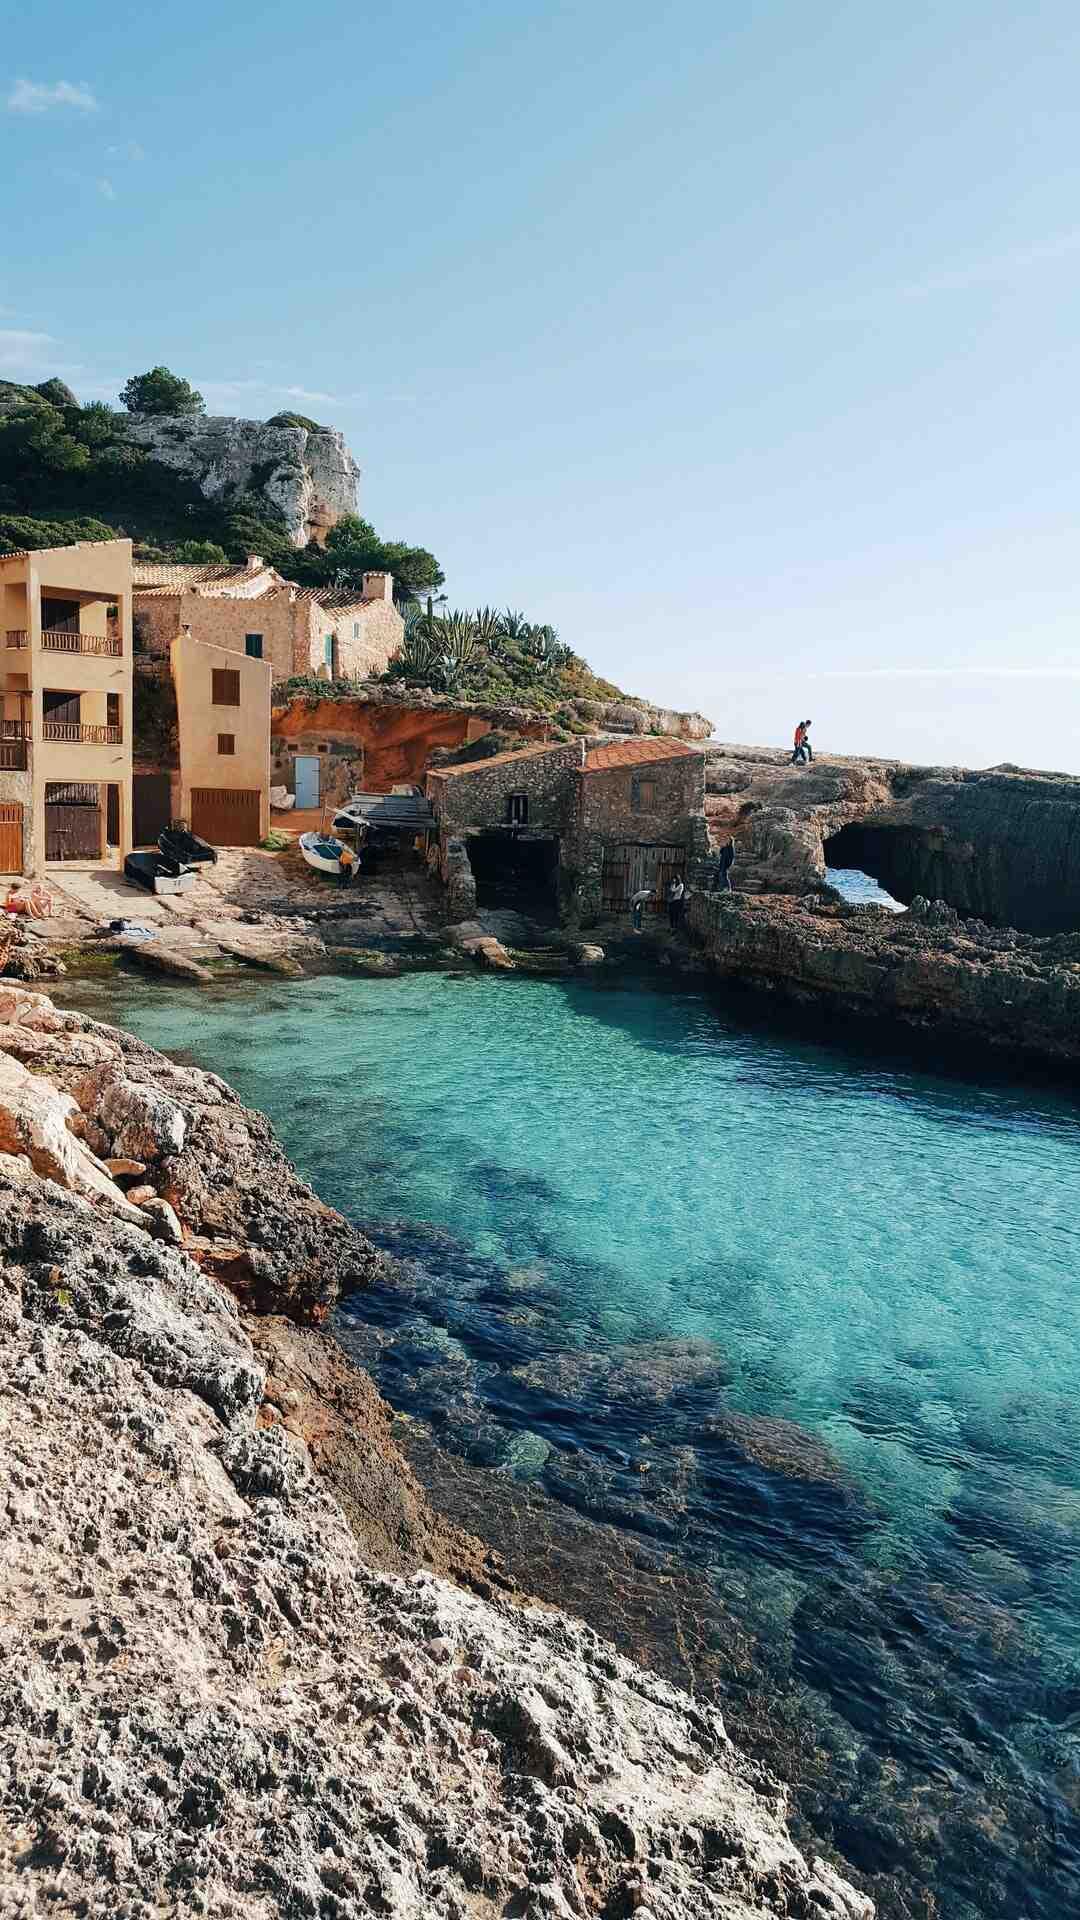 Où partir en vacances en Espagne en couple ?